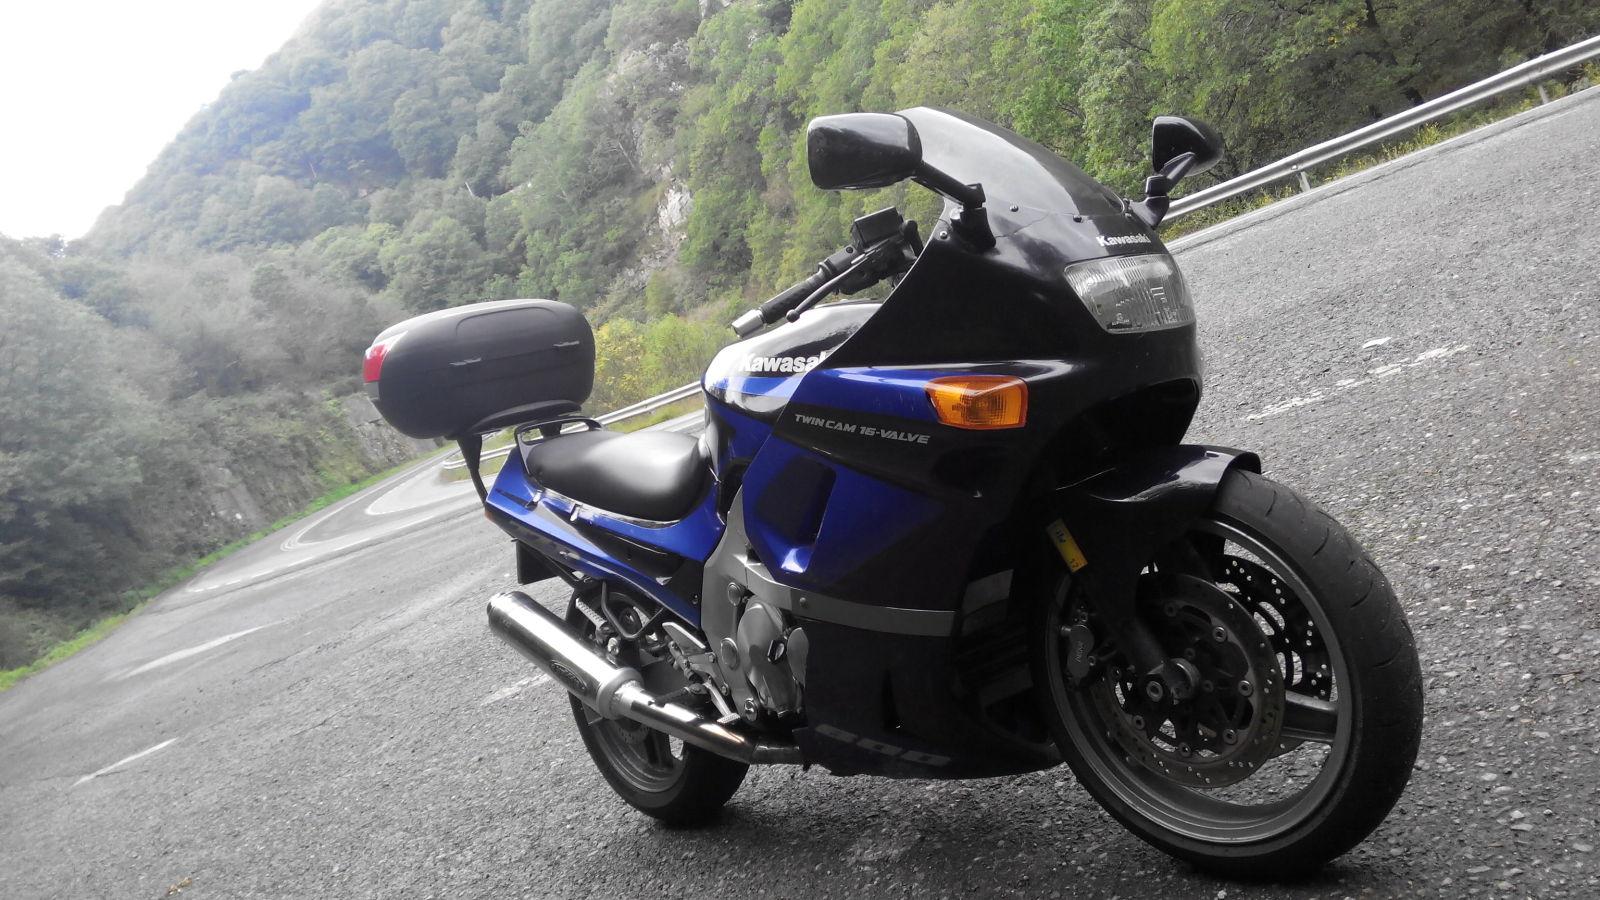 Тест-драйв мотоцикла Kawasaki ZZR600